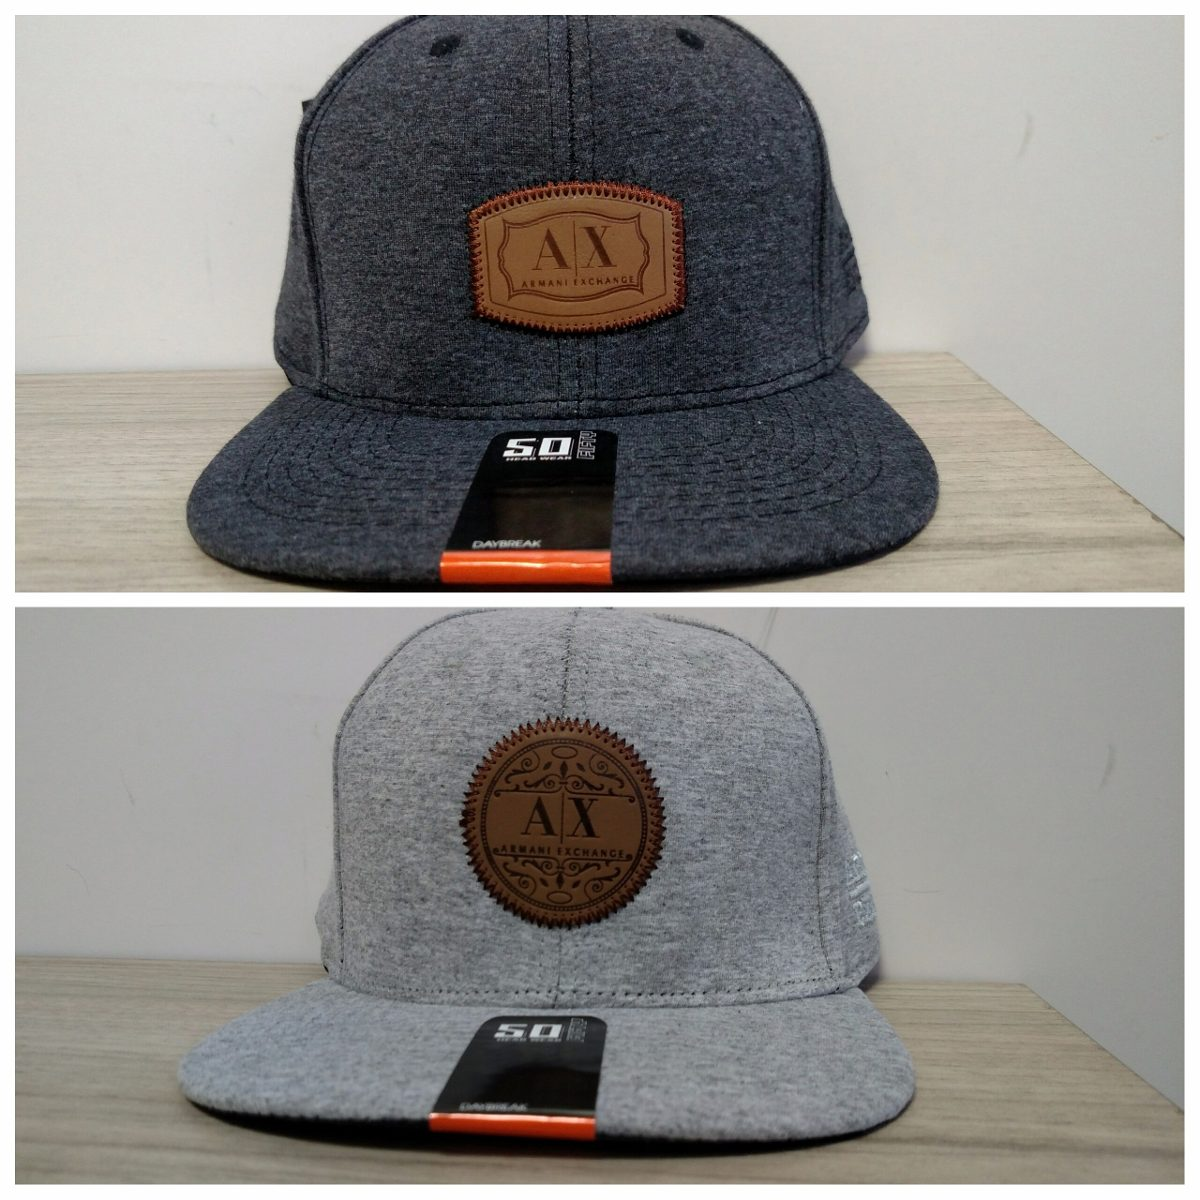 ... boné aba reta fifty armani exchange - head wear fitted cap. Carregando  zoom. eed72c59996091 0fa60e8c30